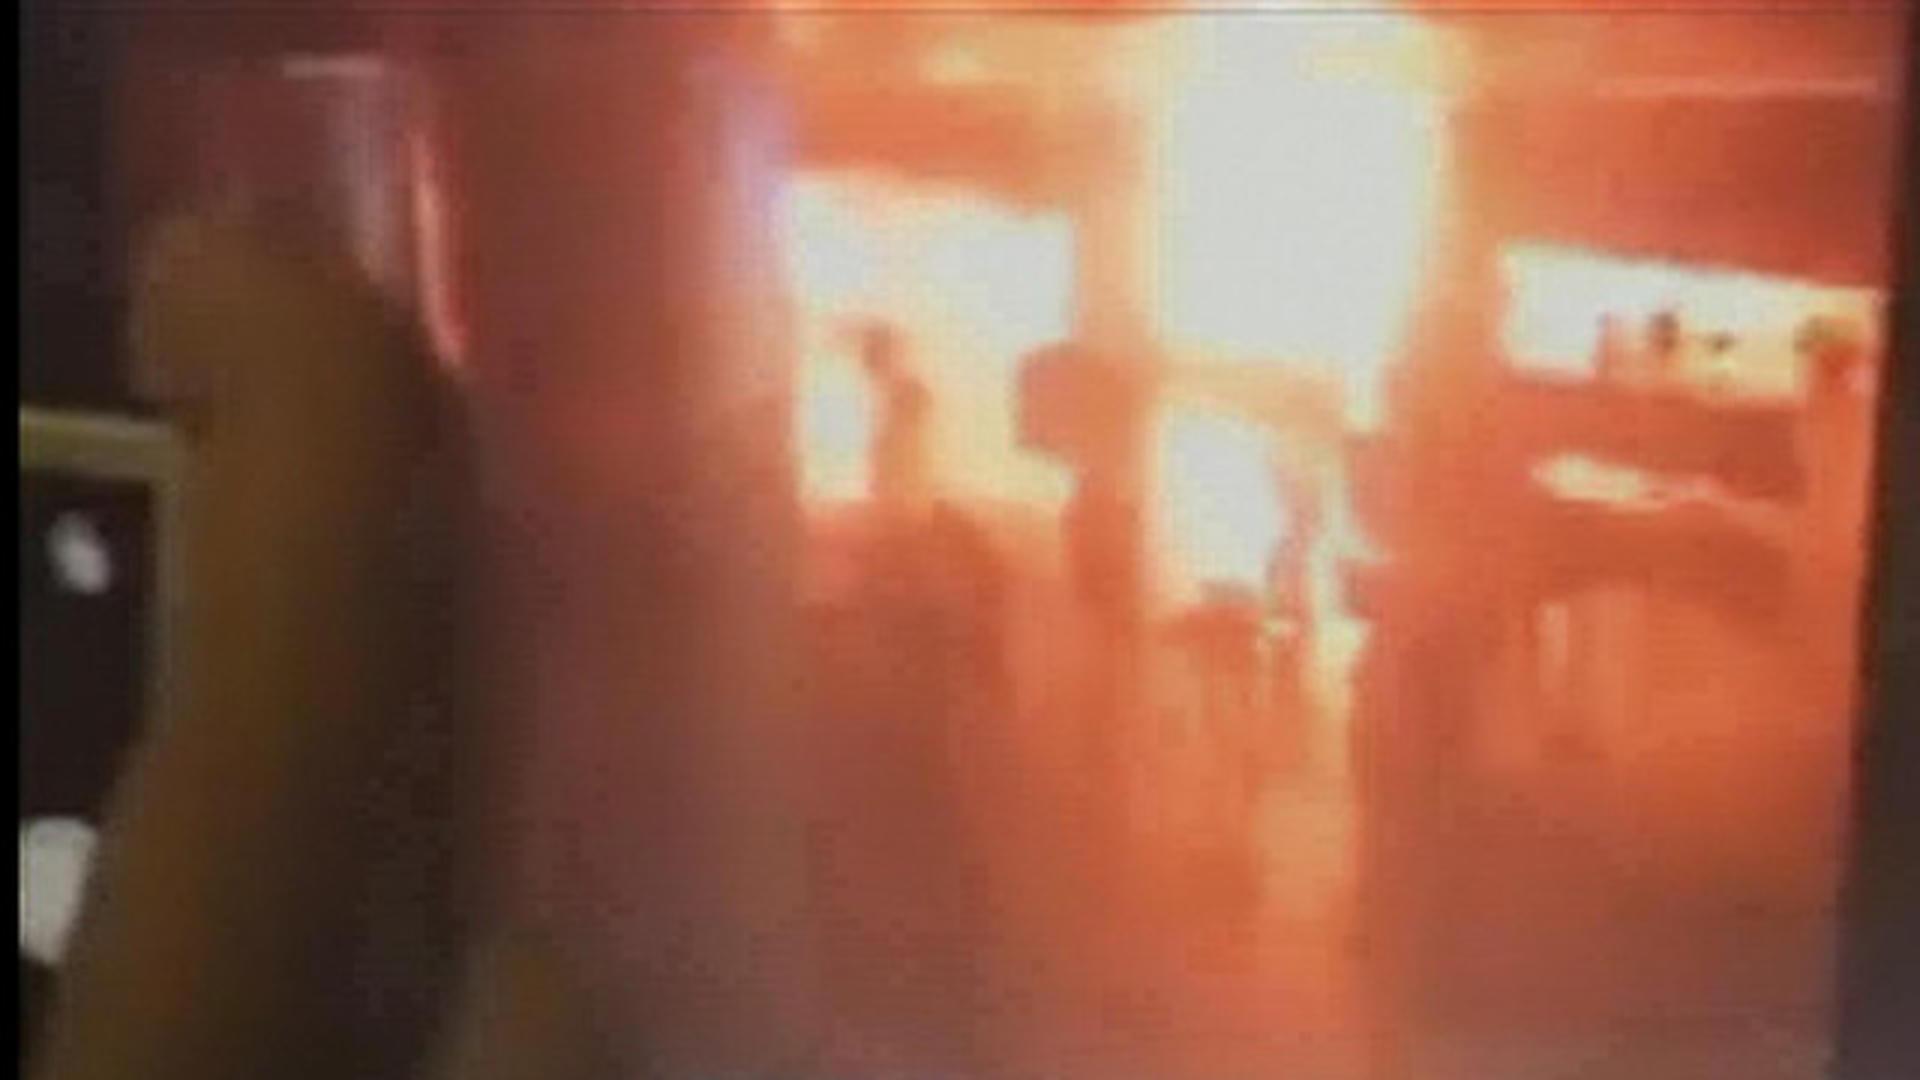 http://www.cbsnews.com/video/adnan-syed-of-serial-gets-new-trial ...